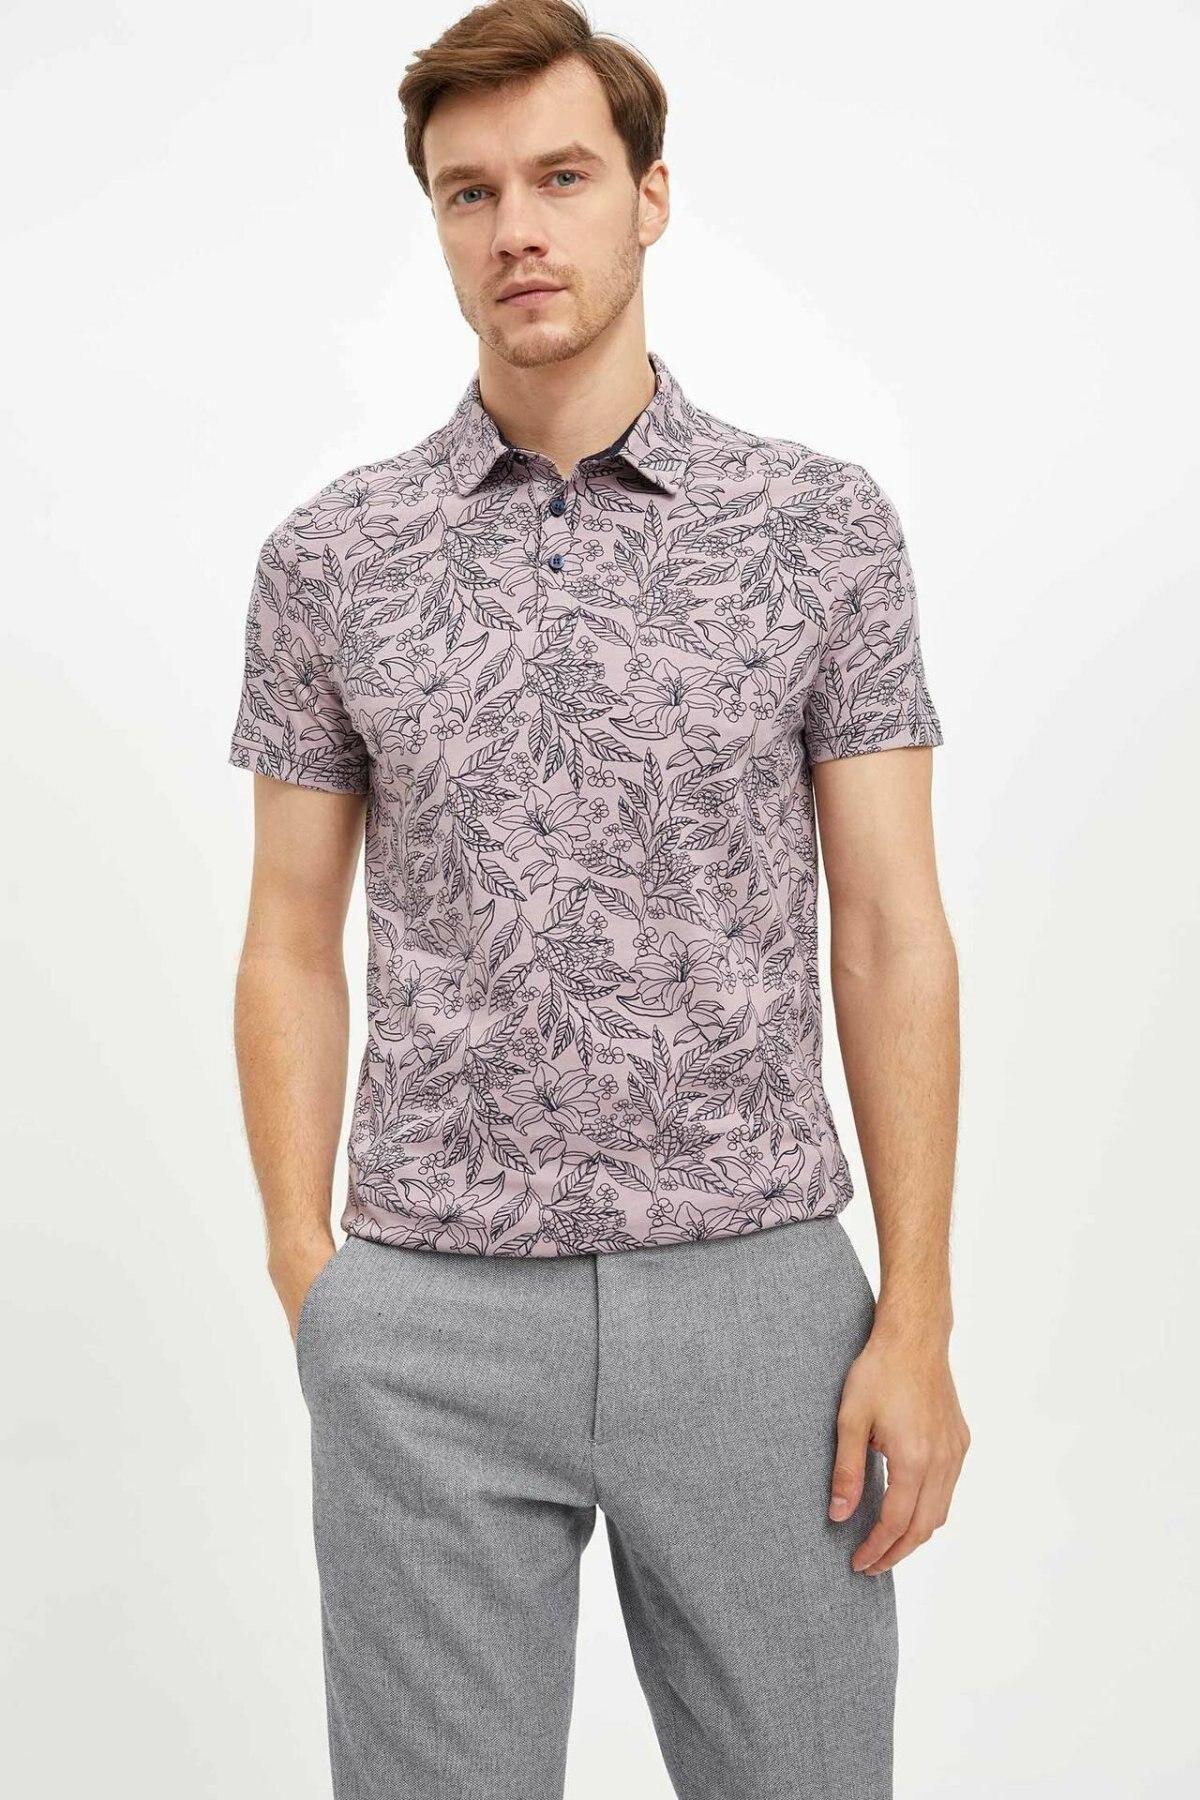 DeFacto Summer Fashion Light Color Print Pattern Leisure Mens Short-Sleeved Shirts Male Casual Lapel New-L6890AZ19AU